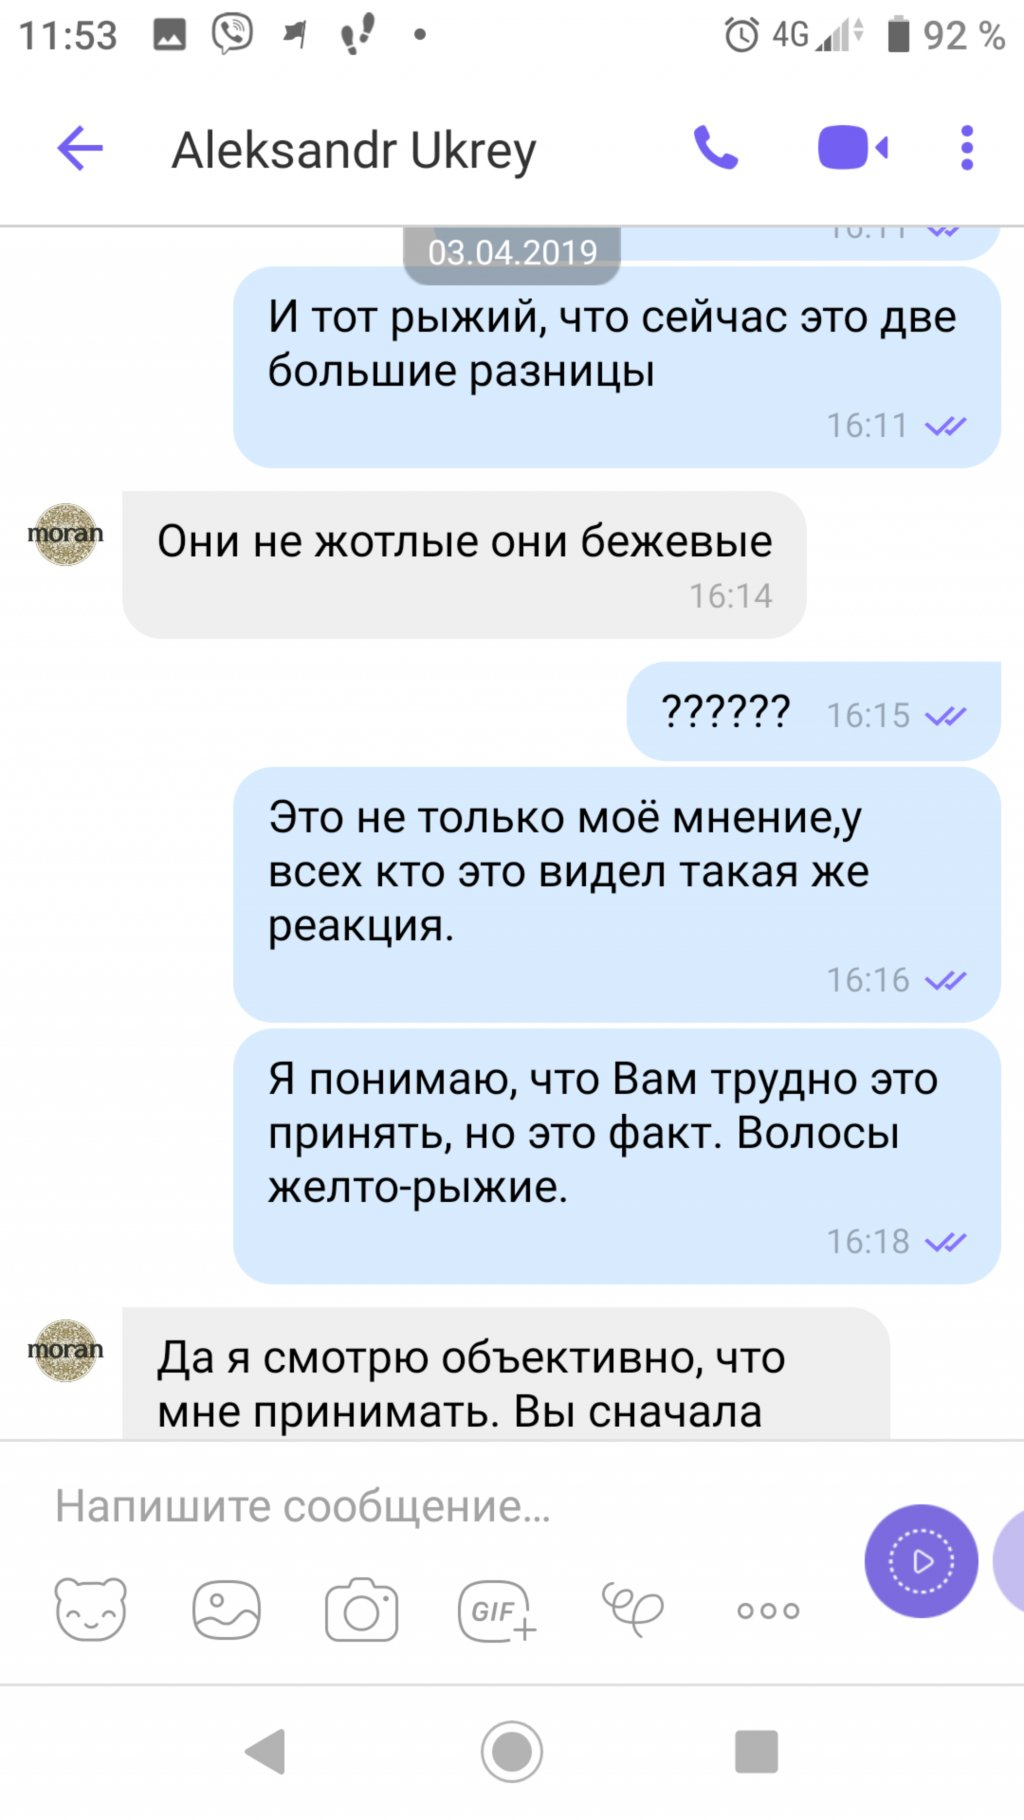 #Хна Moran , #Александр Укрей, #Yourspace - Окрашивание хной моран ,#Moranukraine ,#Moran ukraine ,#Александр Укрей ,#хна моран